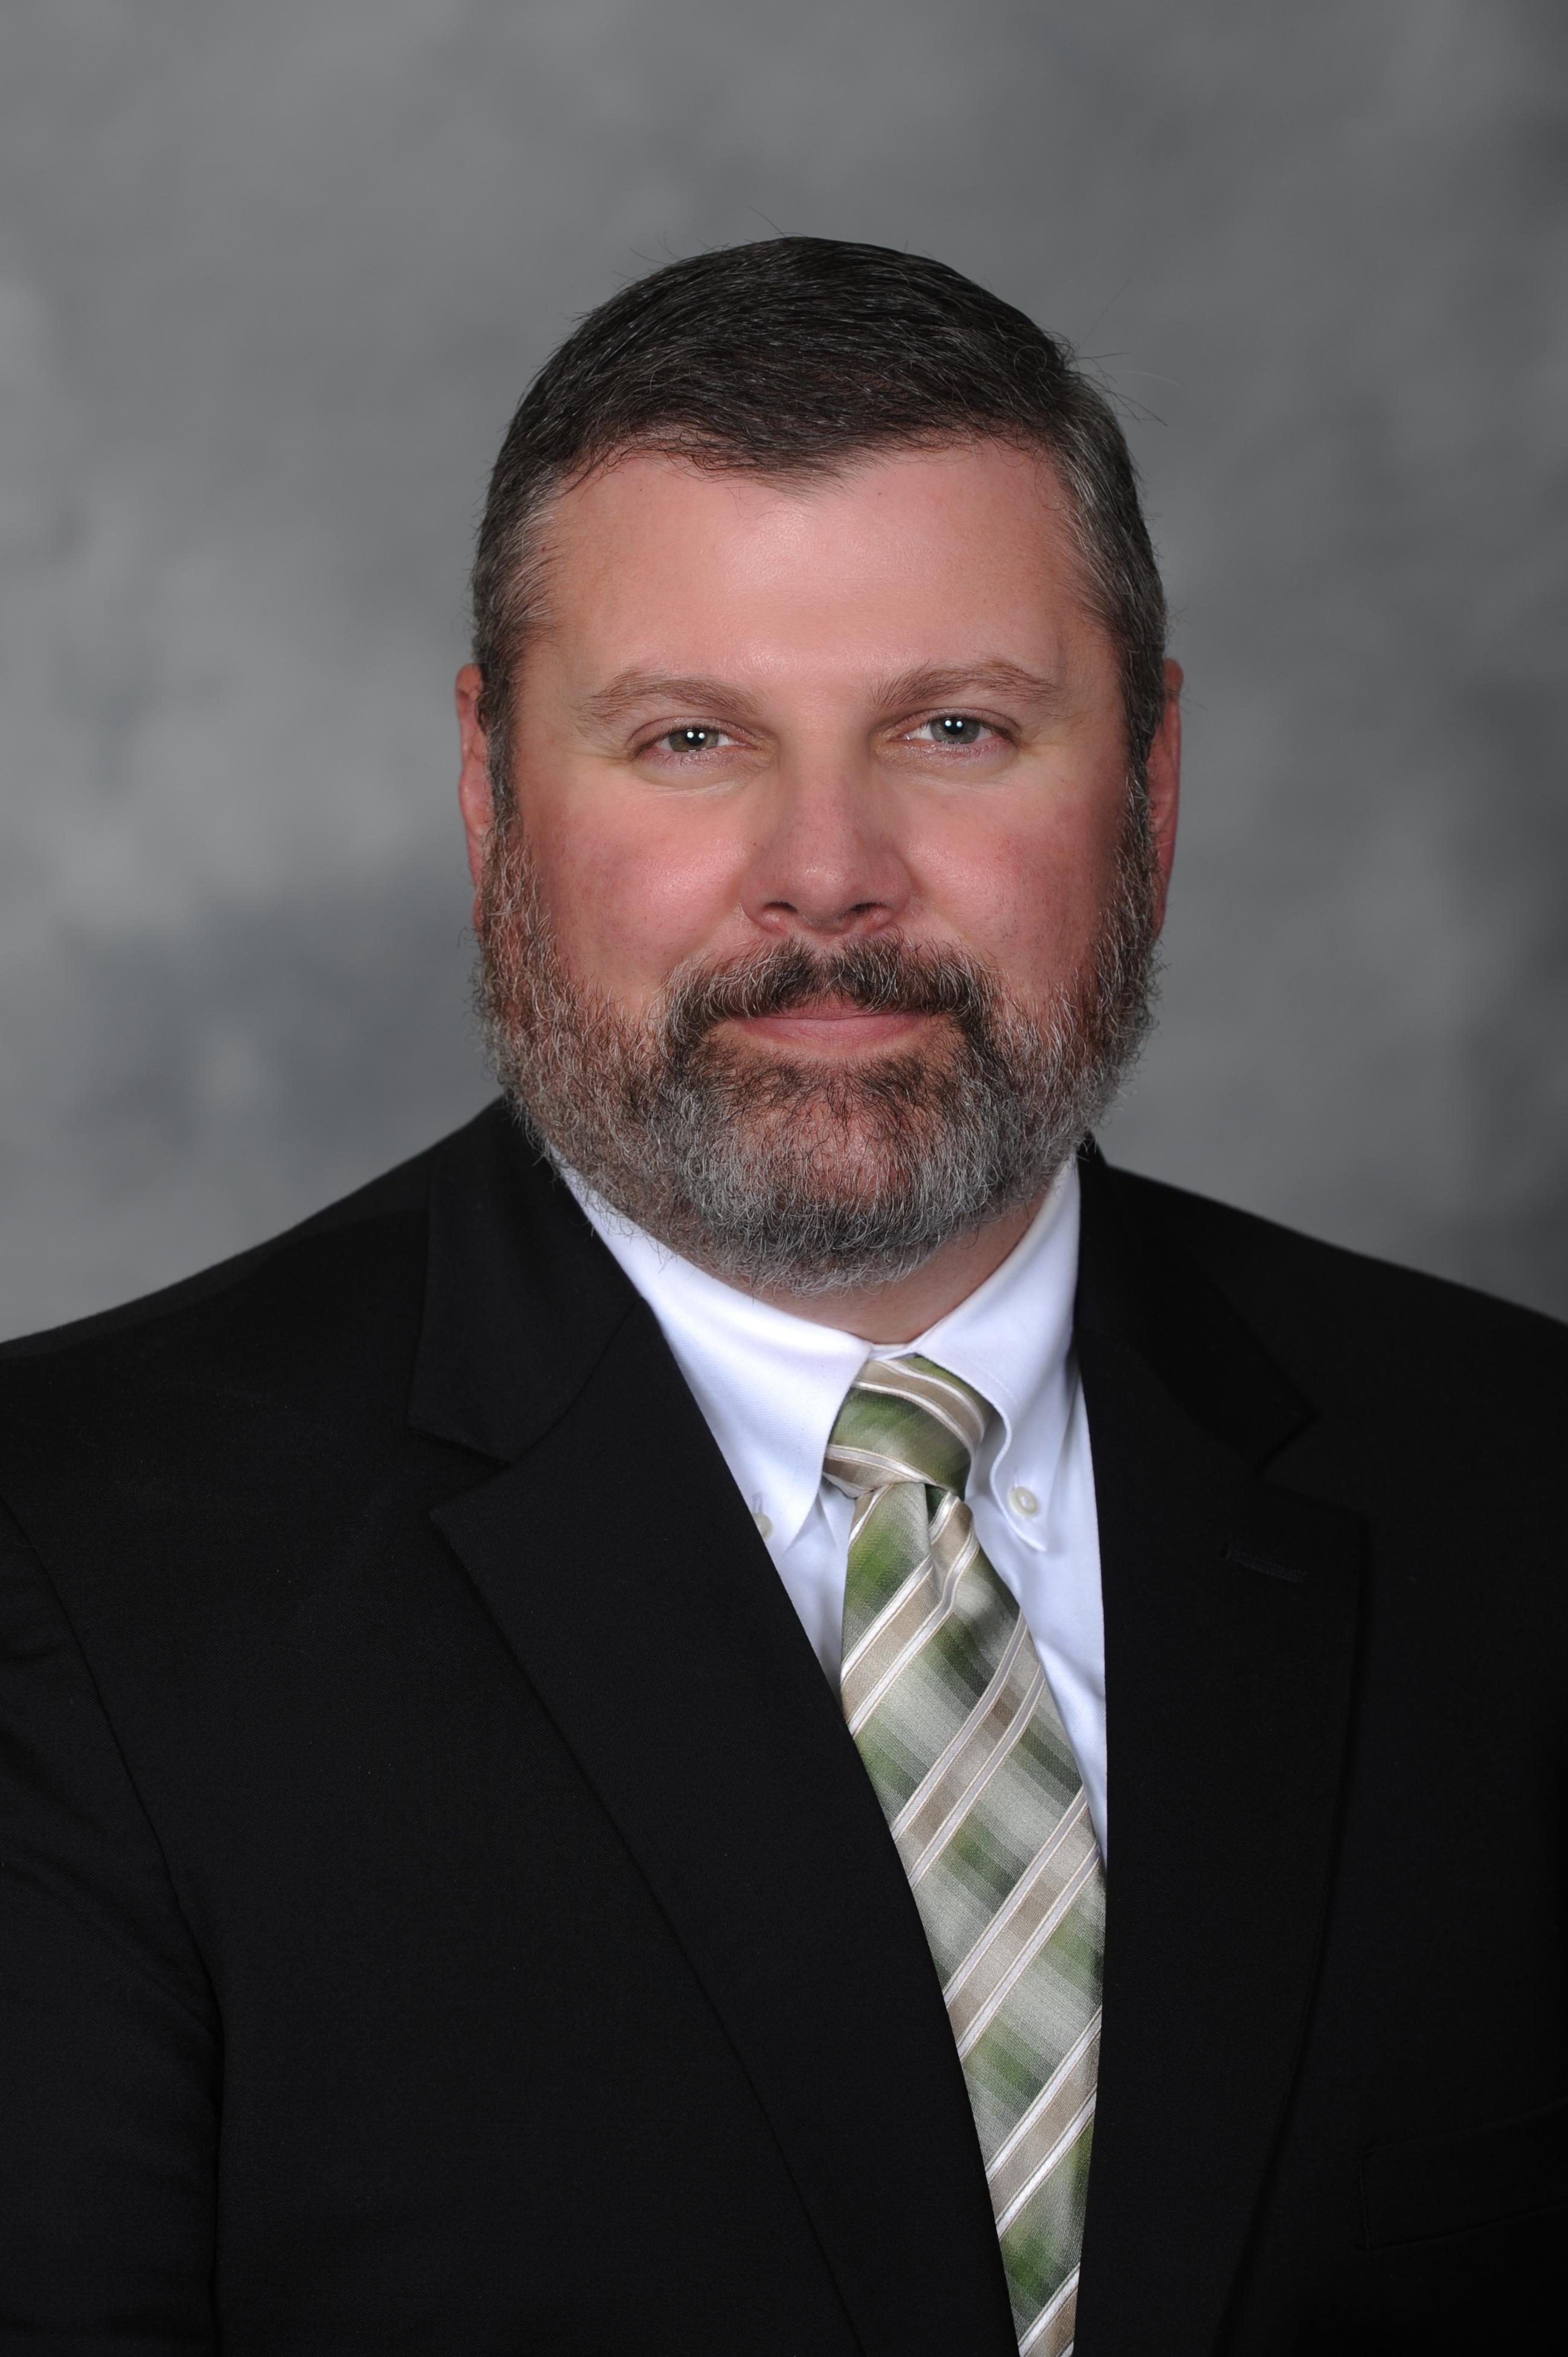 Headshot of Board Director Carlton Lewis